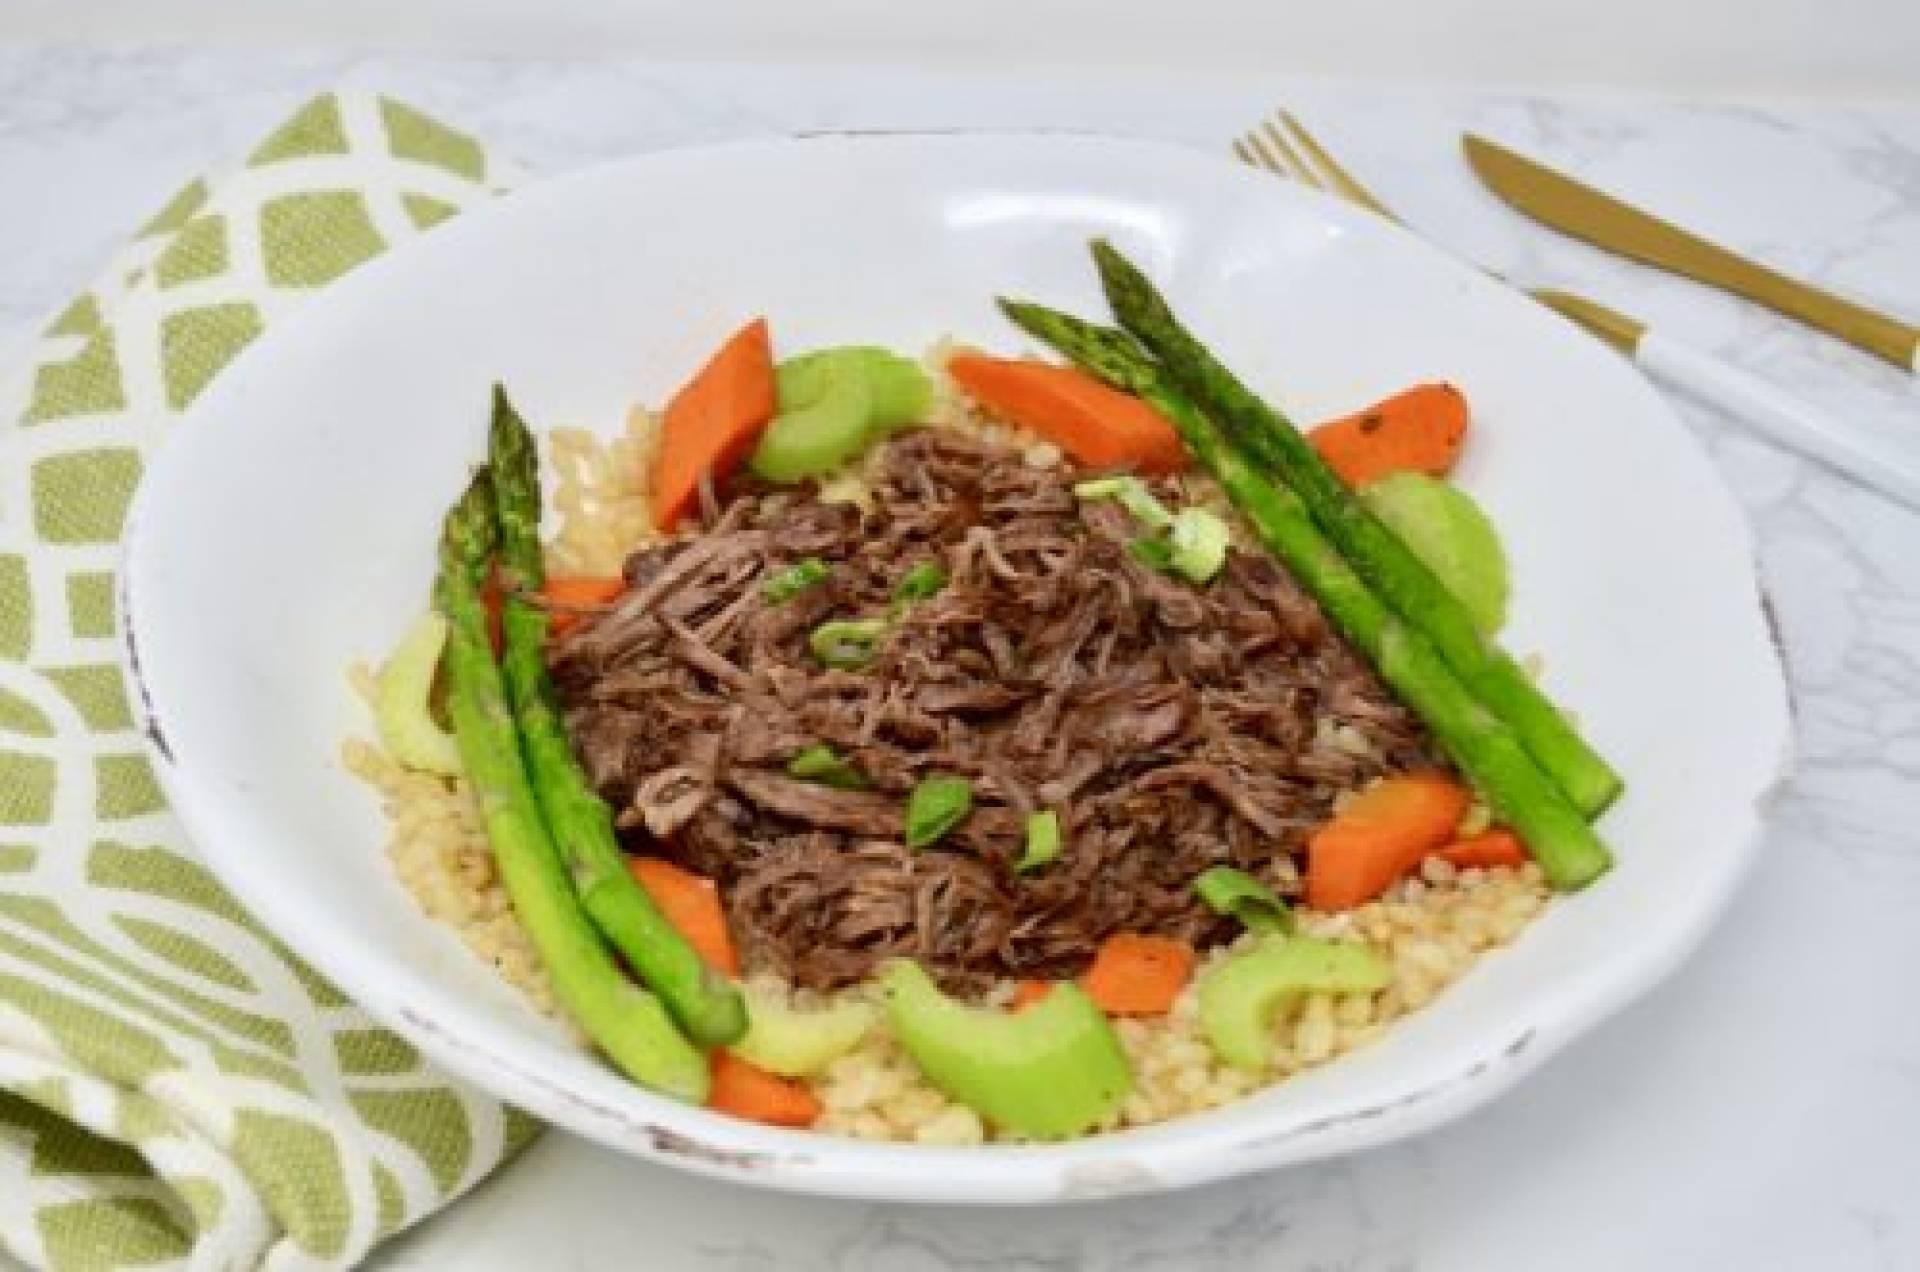 KETO Savory Chuck Roast with Brown Rice